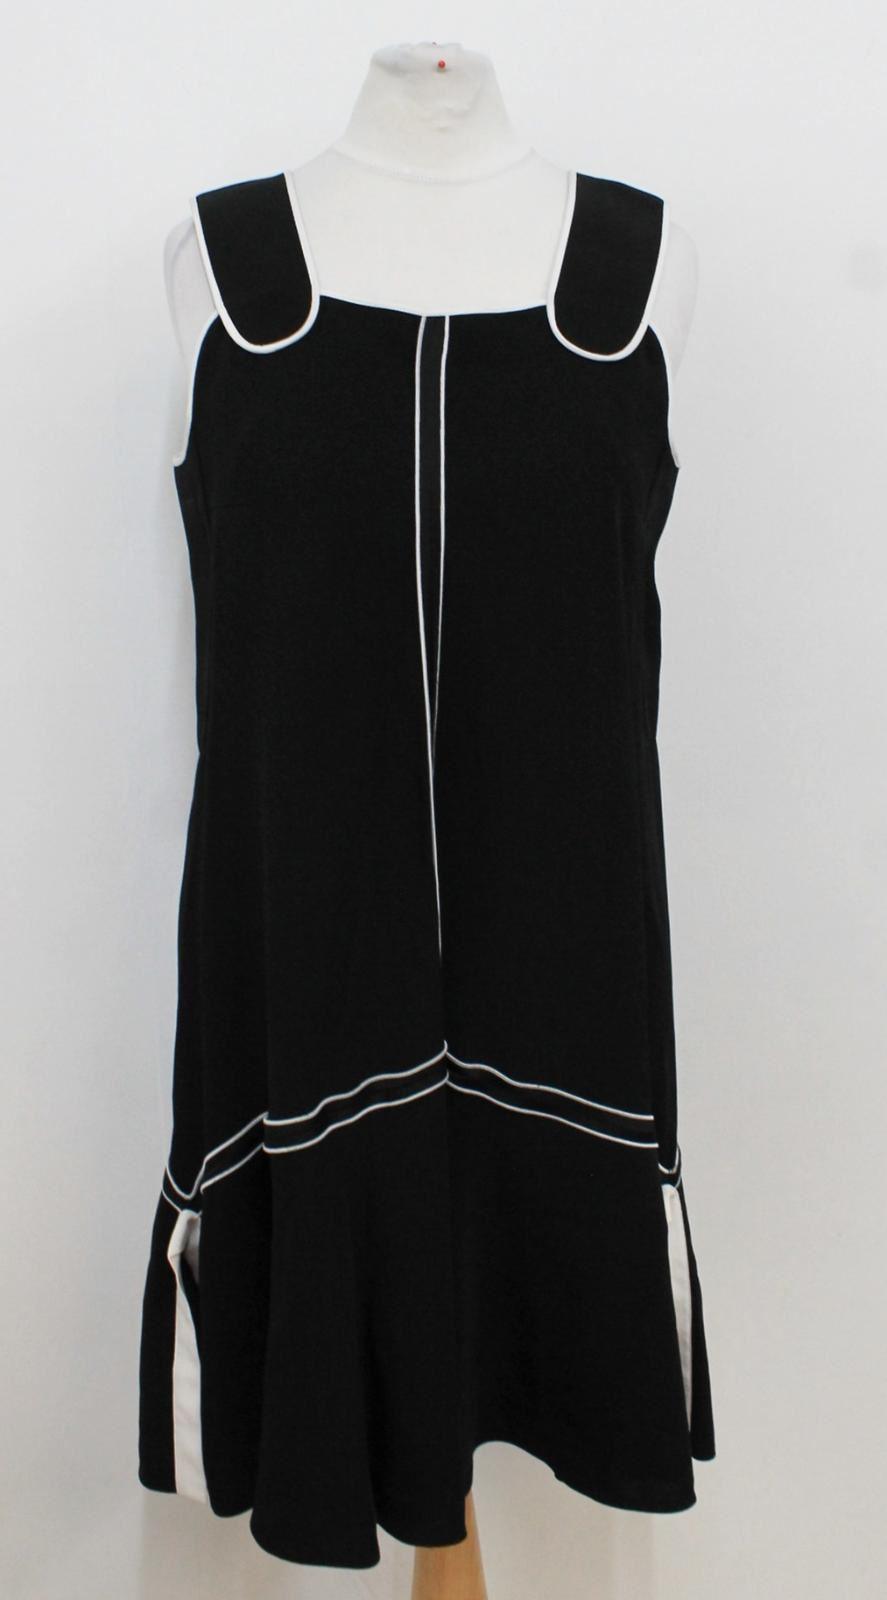 VICTORIA-BECKHAM-Ladies-Black-White-Trims-Sleeveless-Frilled-Hem-Dress-Size-UK6